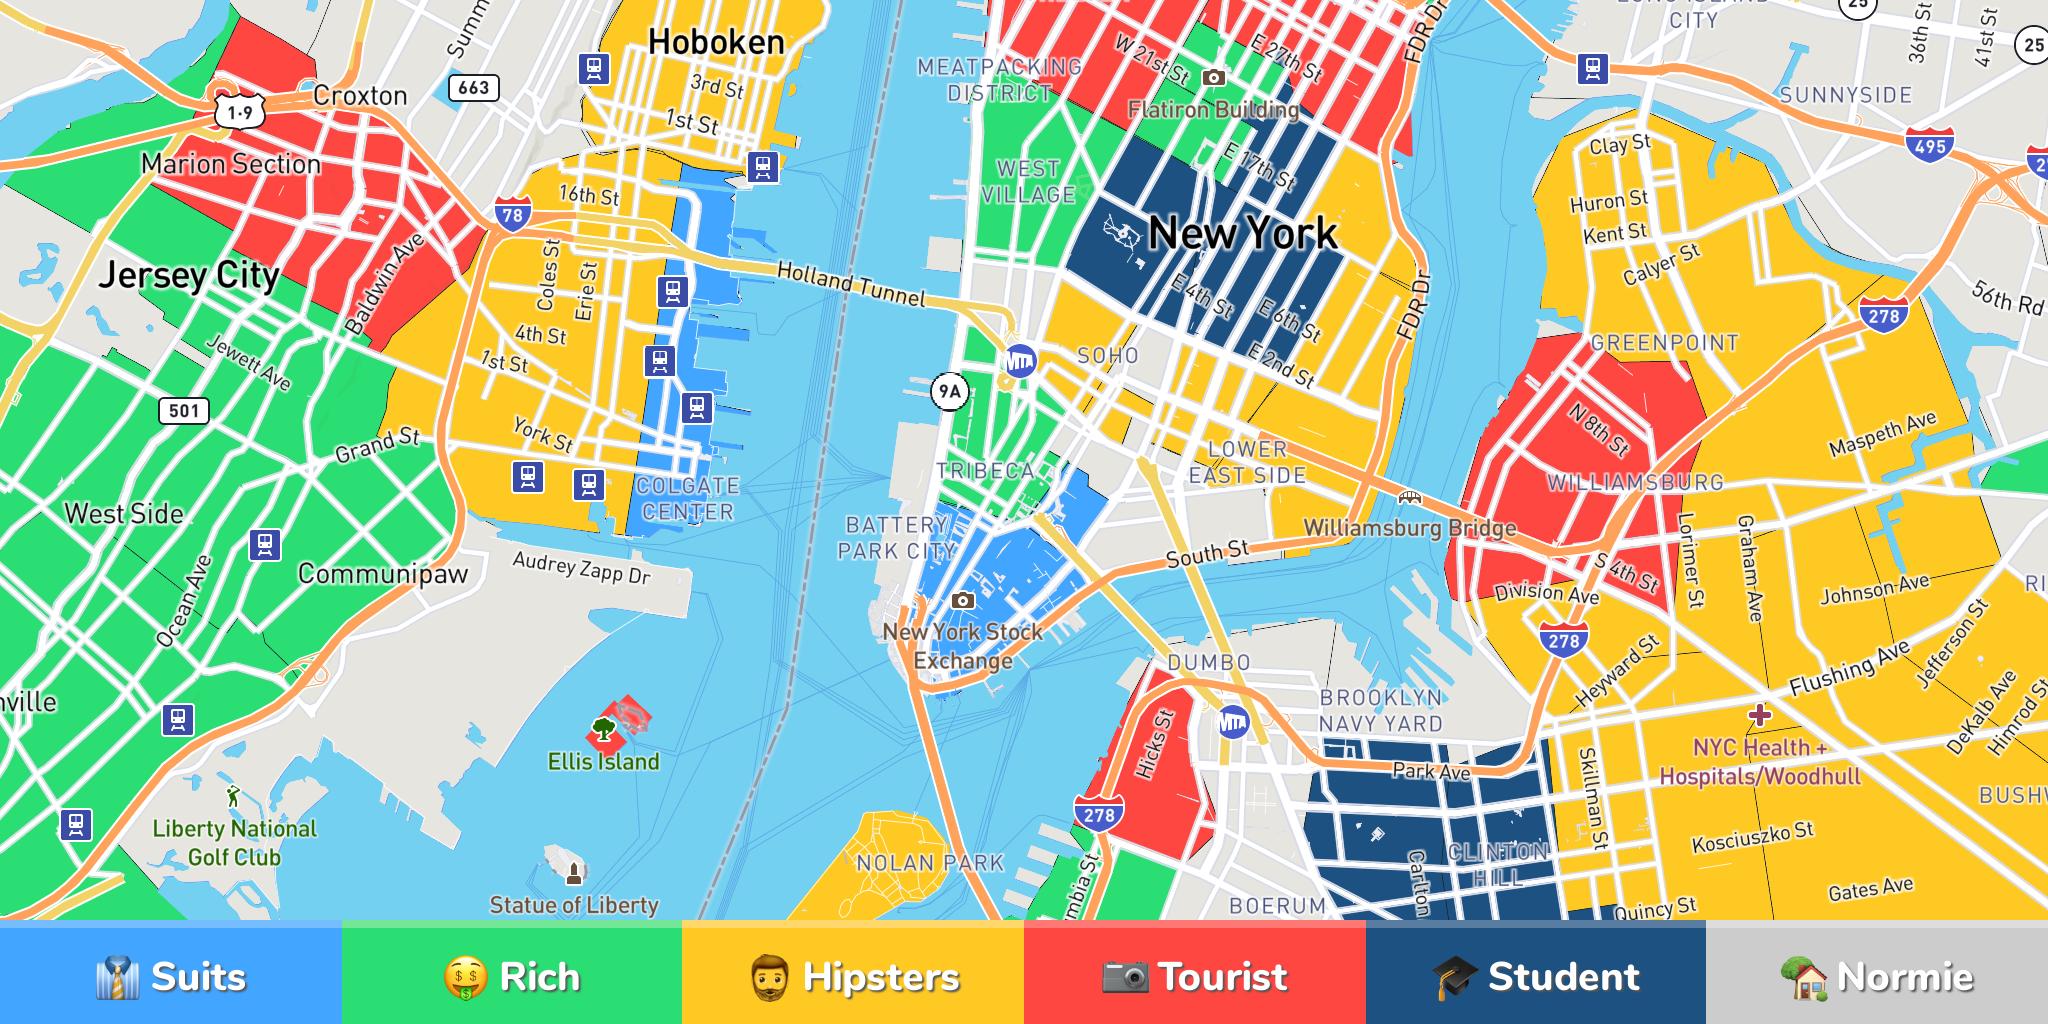 Where to Stay Around the World: Neighborhood Maps by Hoodmaps on old new york neighborhoods, map of bad neighborhoods in new orleans, map of florida neighborhoods, chicago neighborhoods, map of brooklyn, map of bronx new york, map of upstate new york, ny neighborhoods, map of north miami neighborhoods, nyc neighborhoods, map of gary neighborhoods, map of newark neighborhoods, map of nyc airports, map of wilmington neighborhoods, map of burlington neighborhoods, map of san francisco neighborhoods, map of neighborhoods in portland, map of worcester neighborhoods, map of port orange neighborhoods, map of frankfurt neighborhoods,